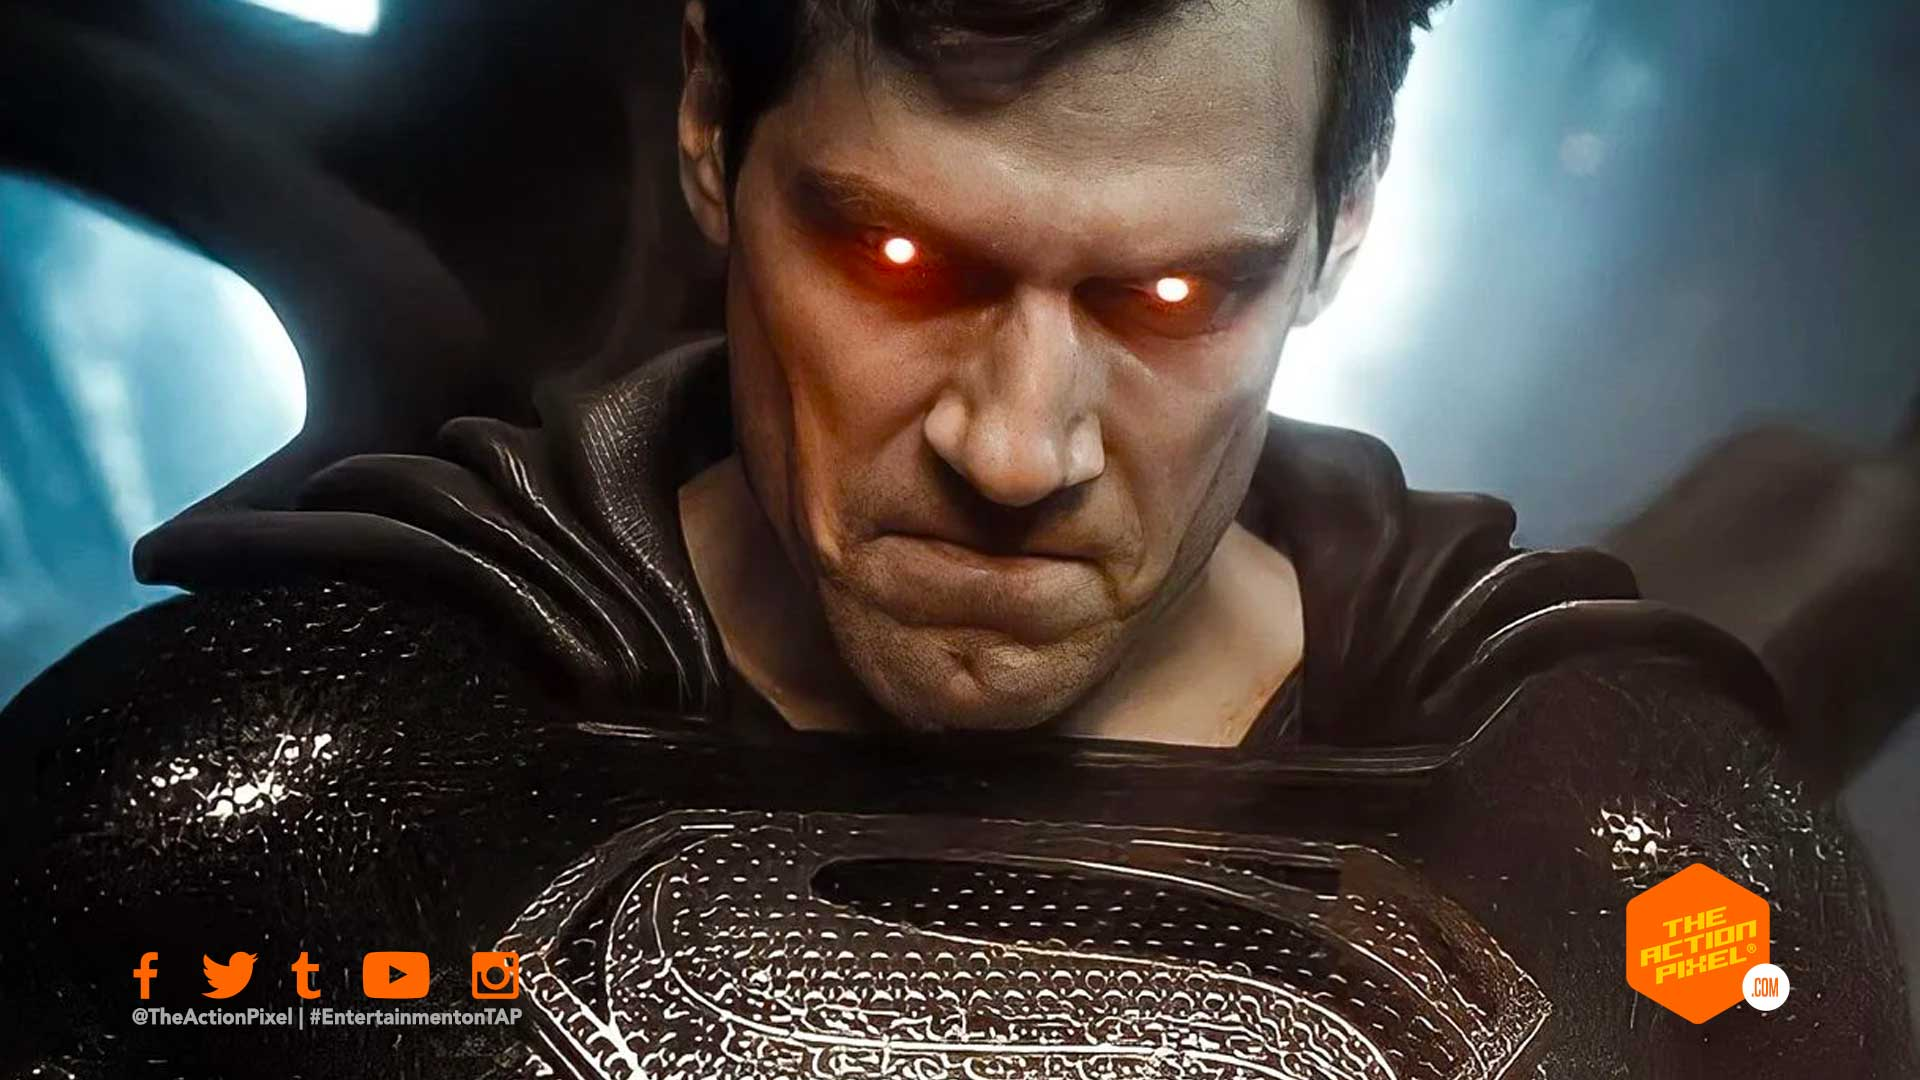 superman, snyder cut, Black suit, kal-el, clark kent, henry cavill, snyder's justice league, justice league, hbo max, entertainment on tap, featured